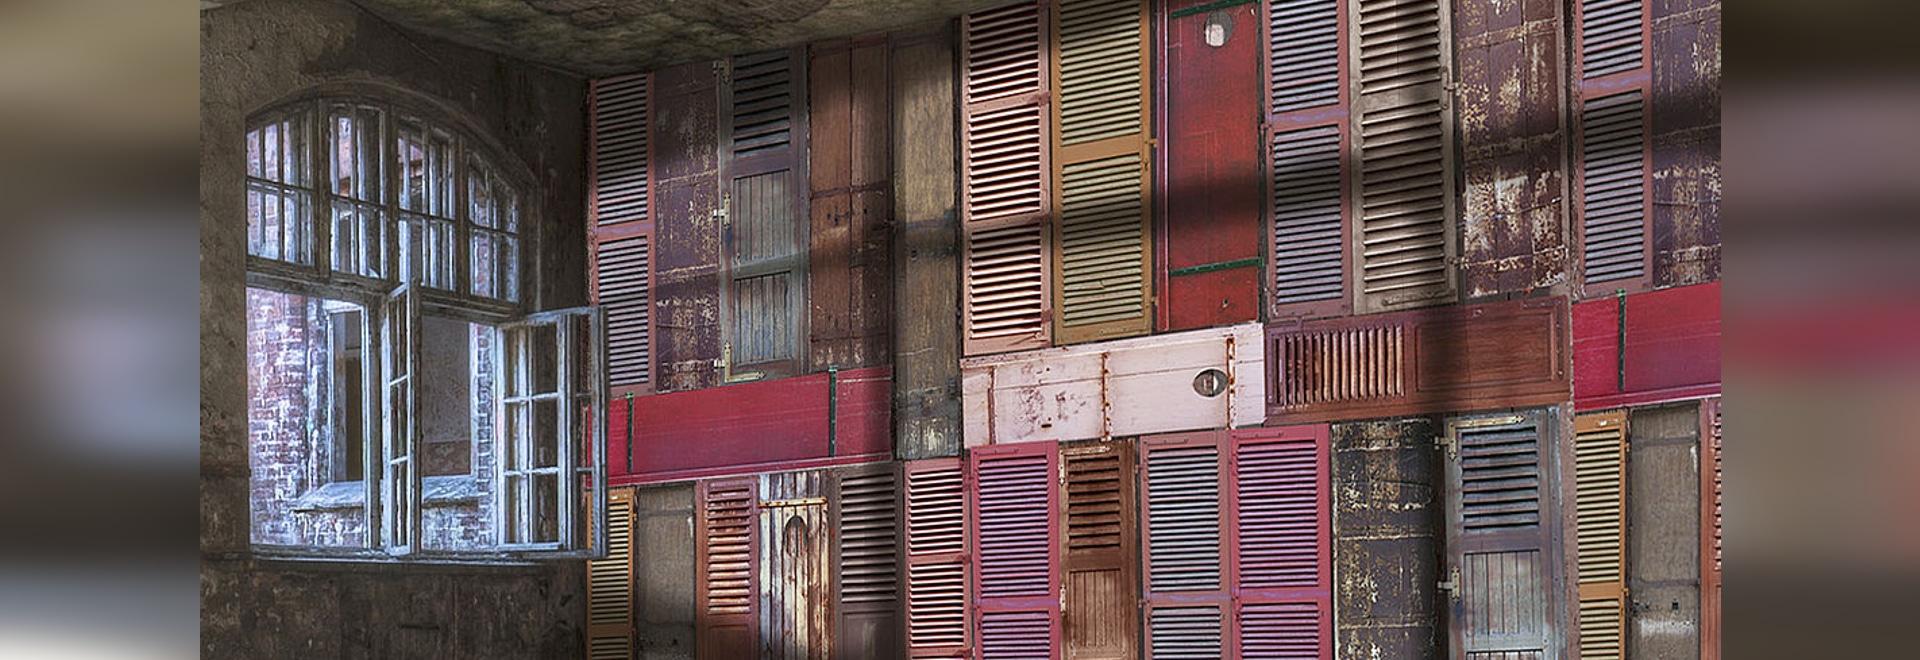 Wooden Shutter In Color Pattern Wallpaper In Creation